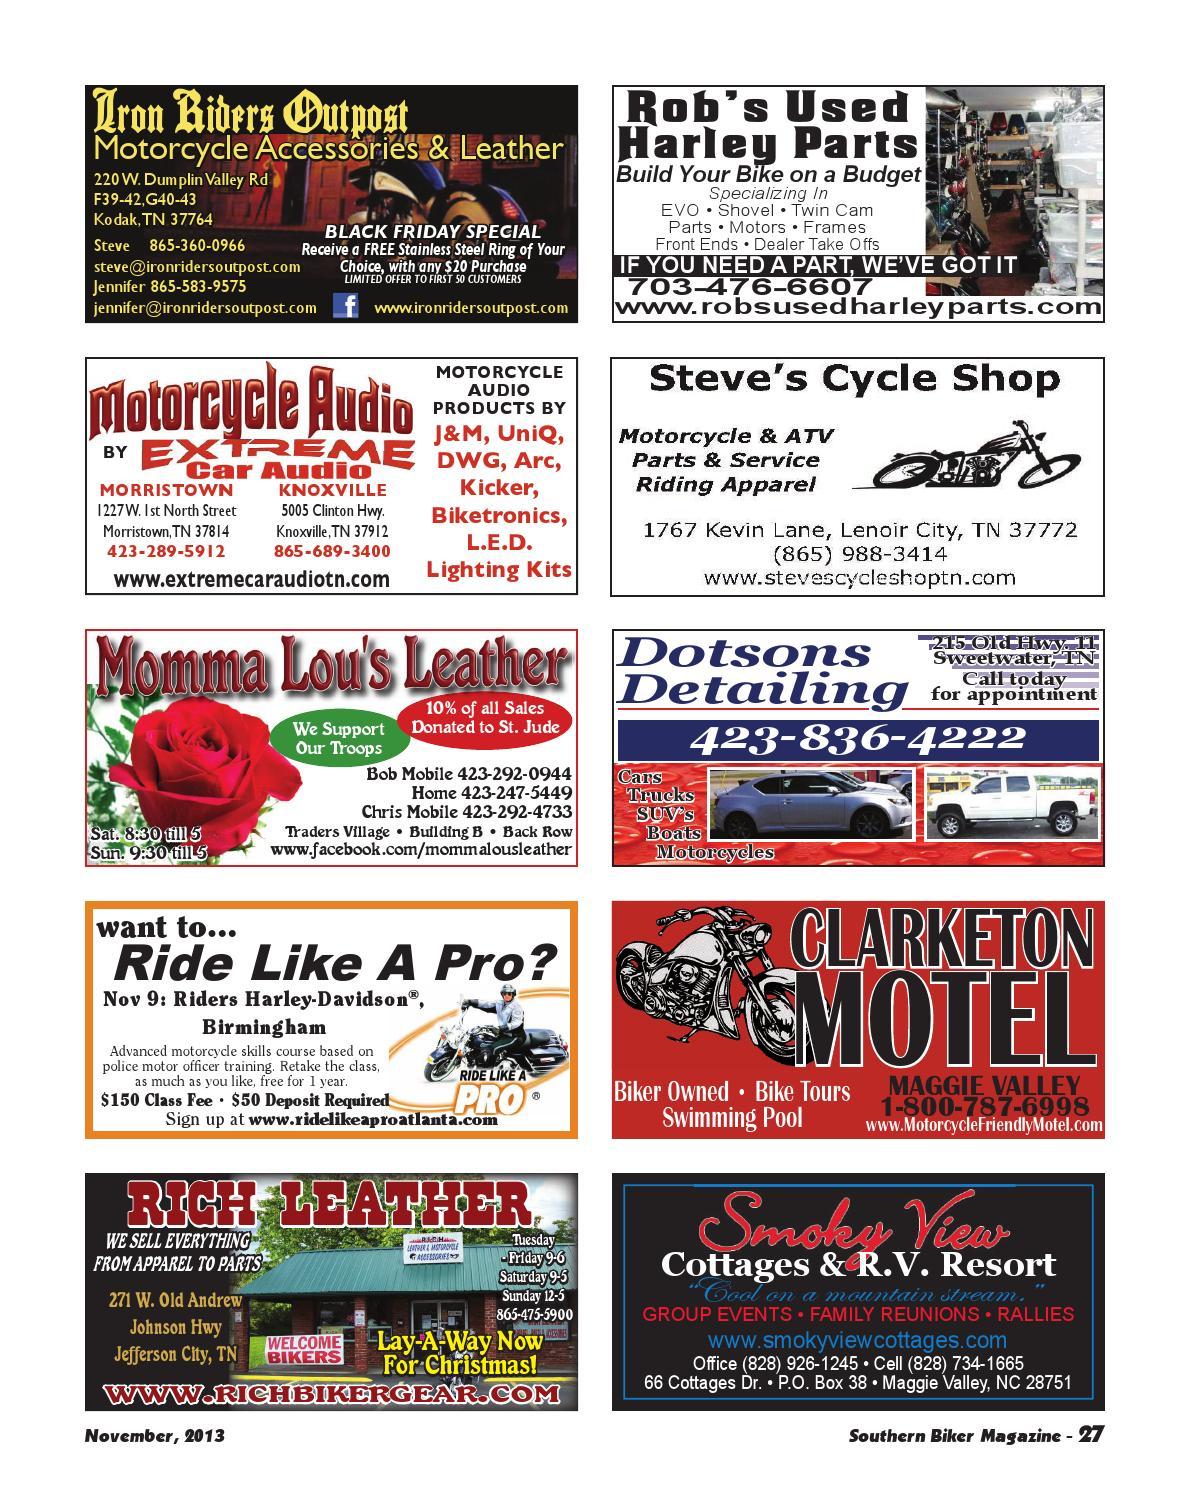 Southern Biker Magazine November 2013 by Kristin Gracy - issuu